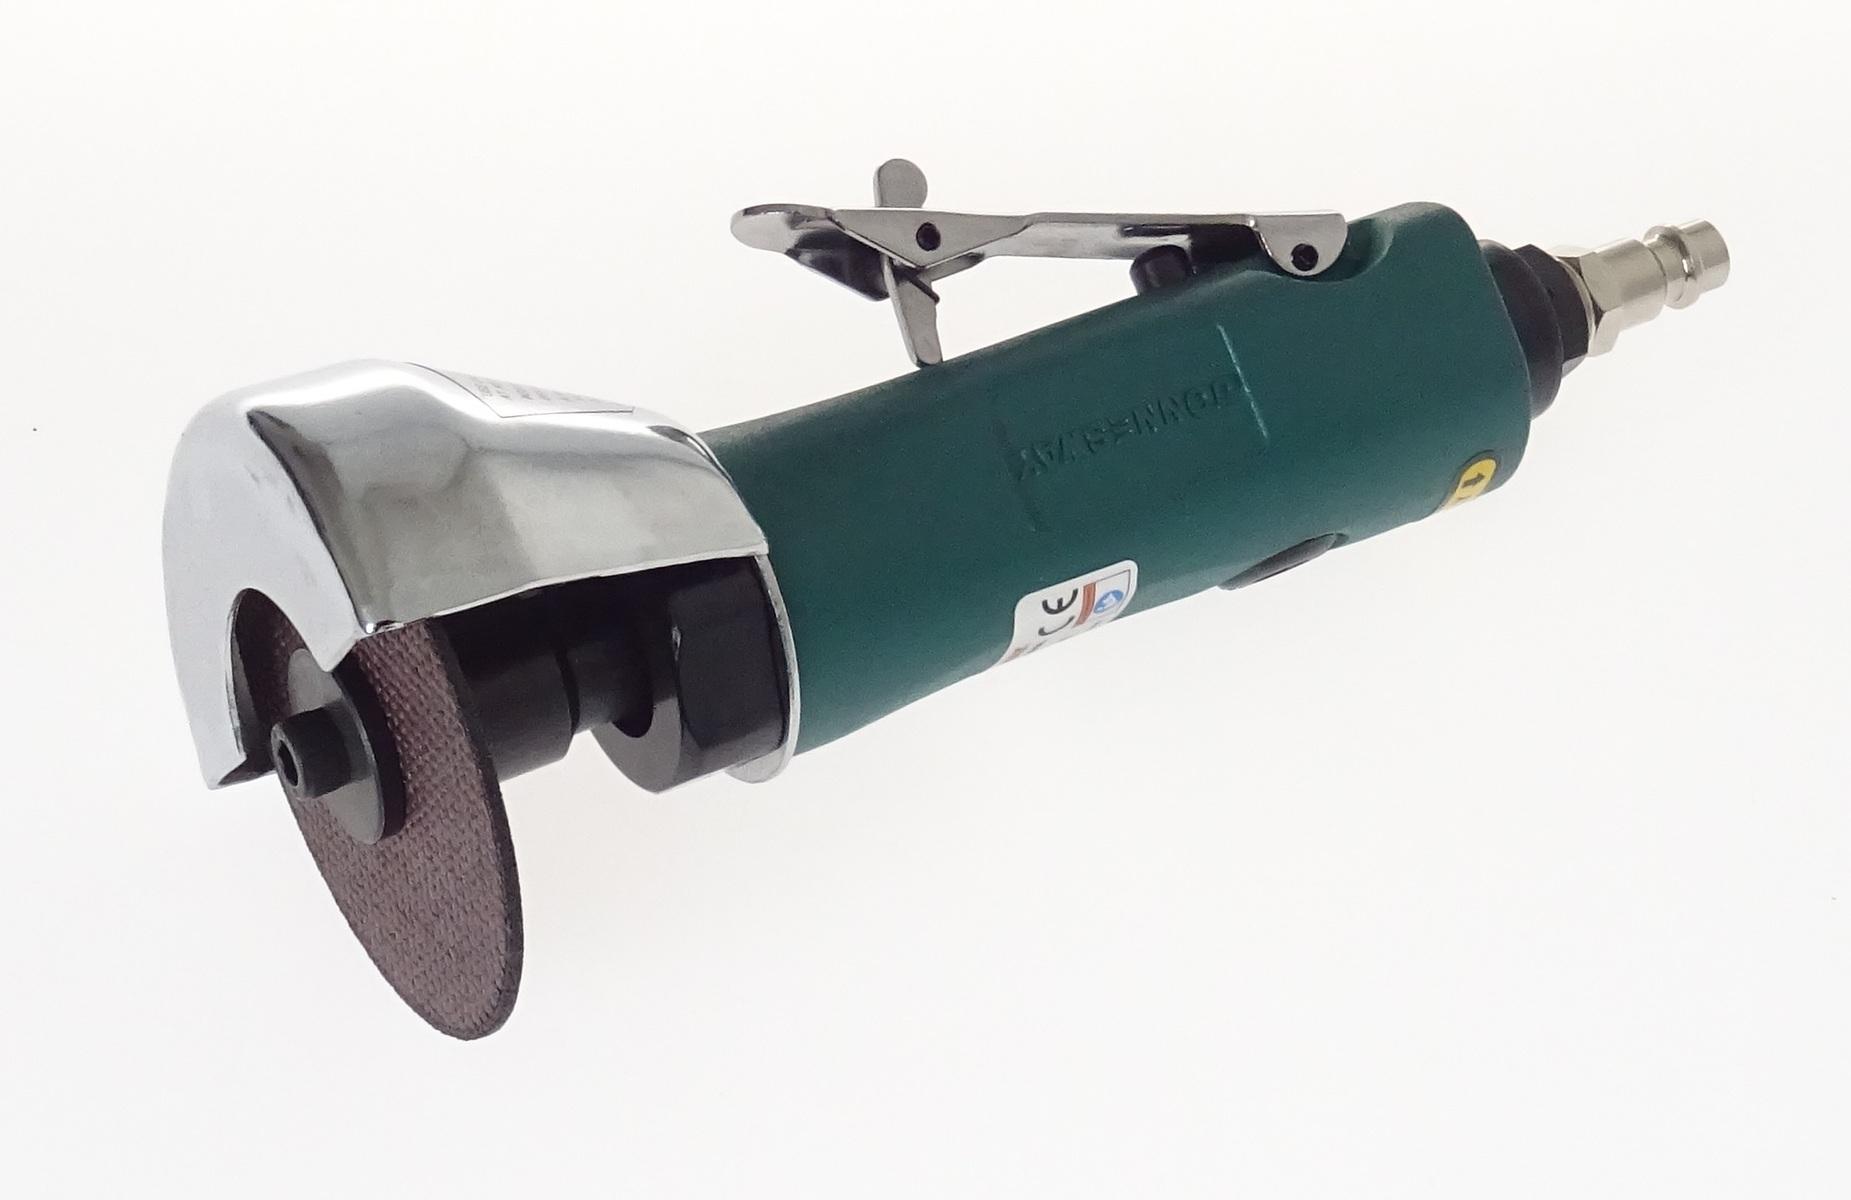 Pneumatická bruska 80 mm - JONNESWAY JAT-6421